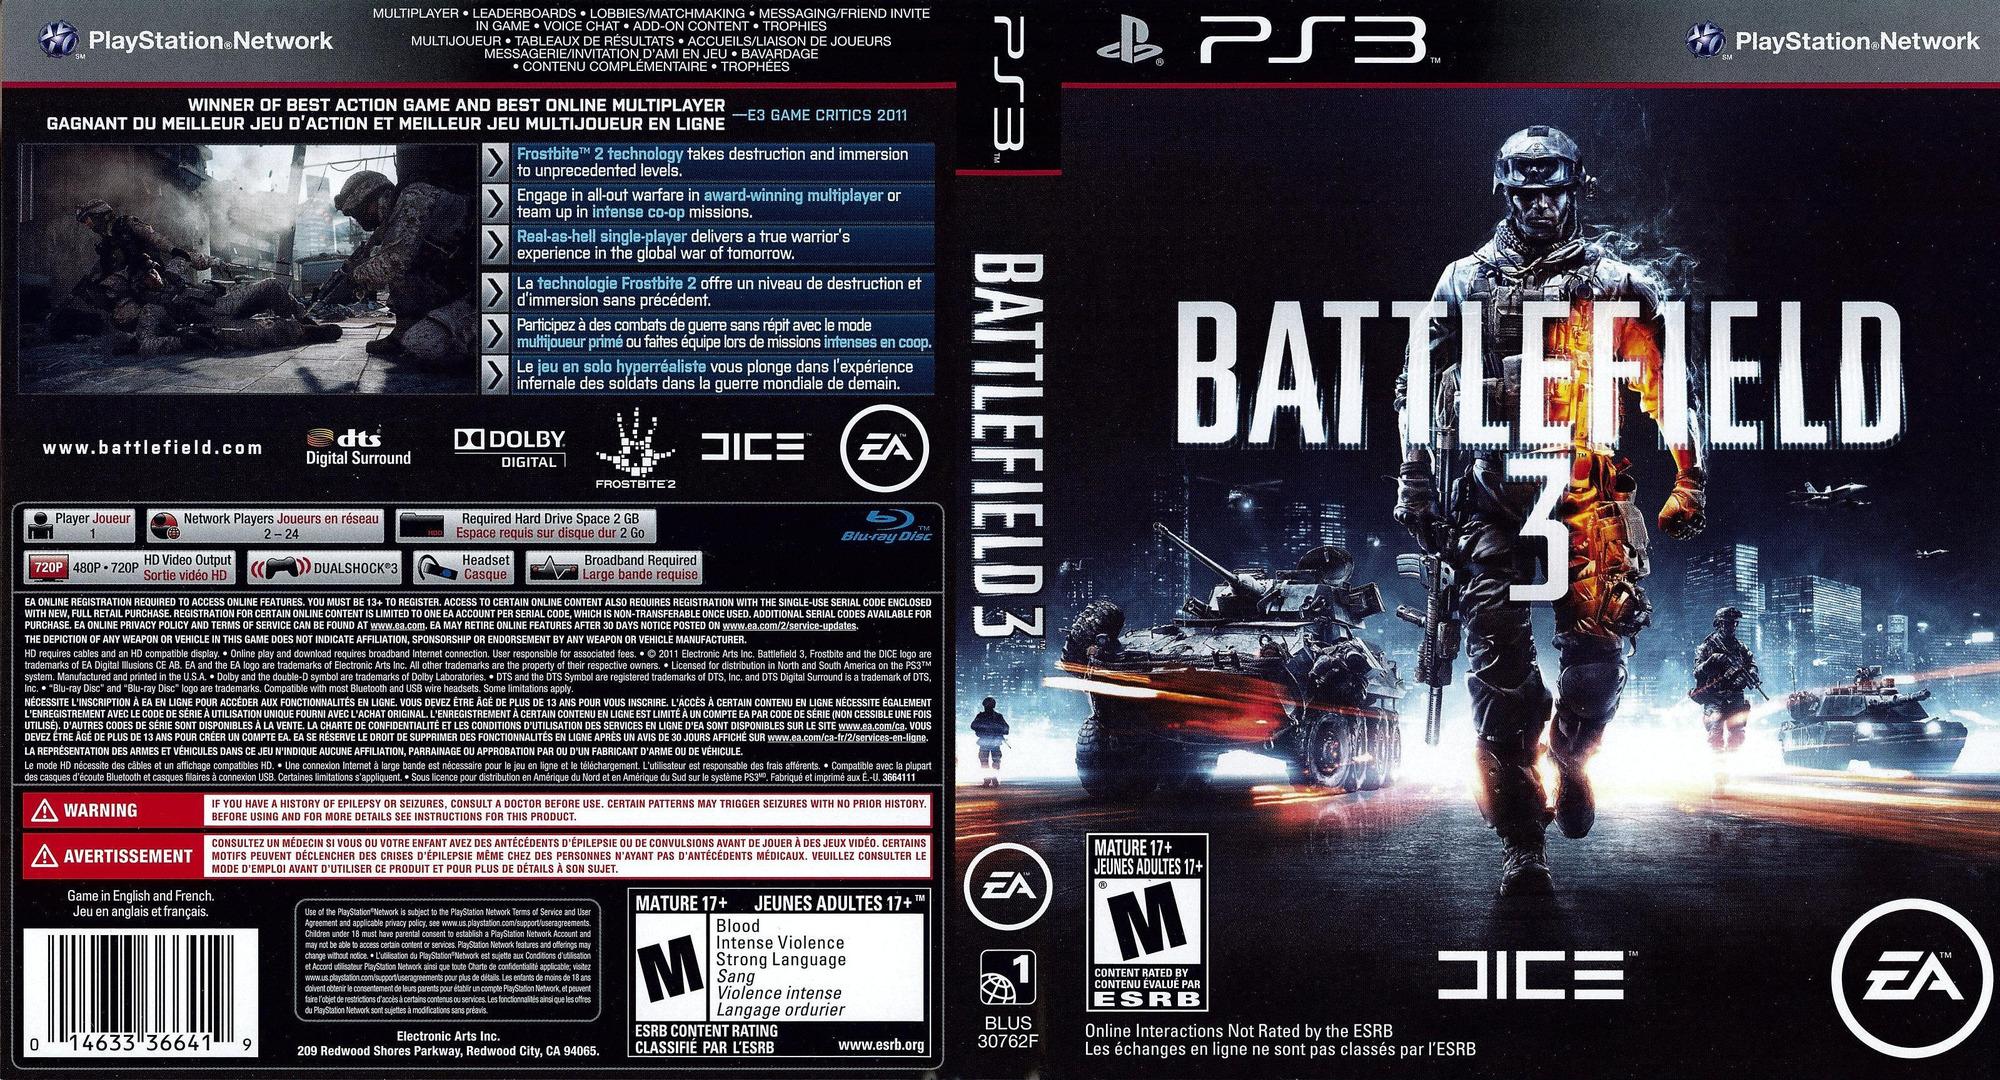 BLUS30762 - Battlefield 3